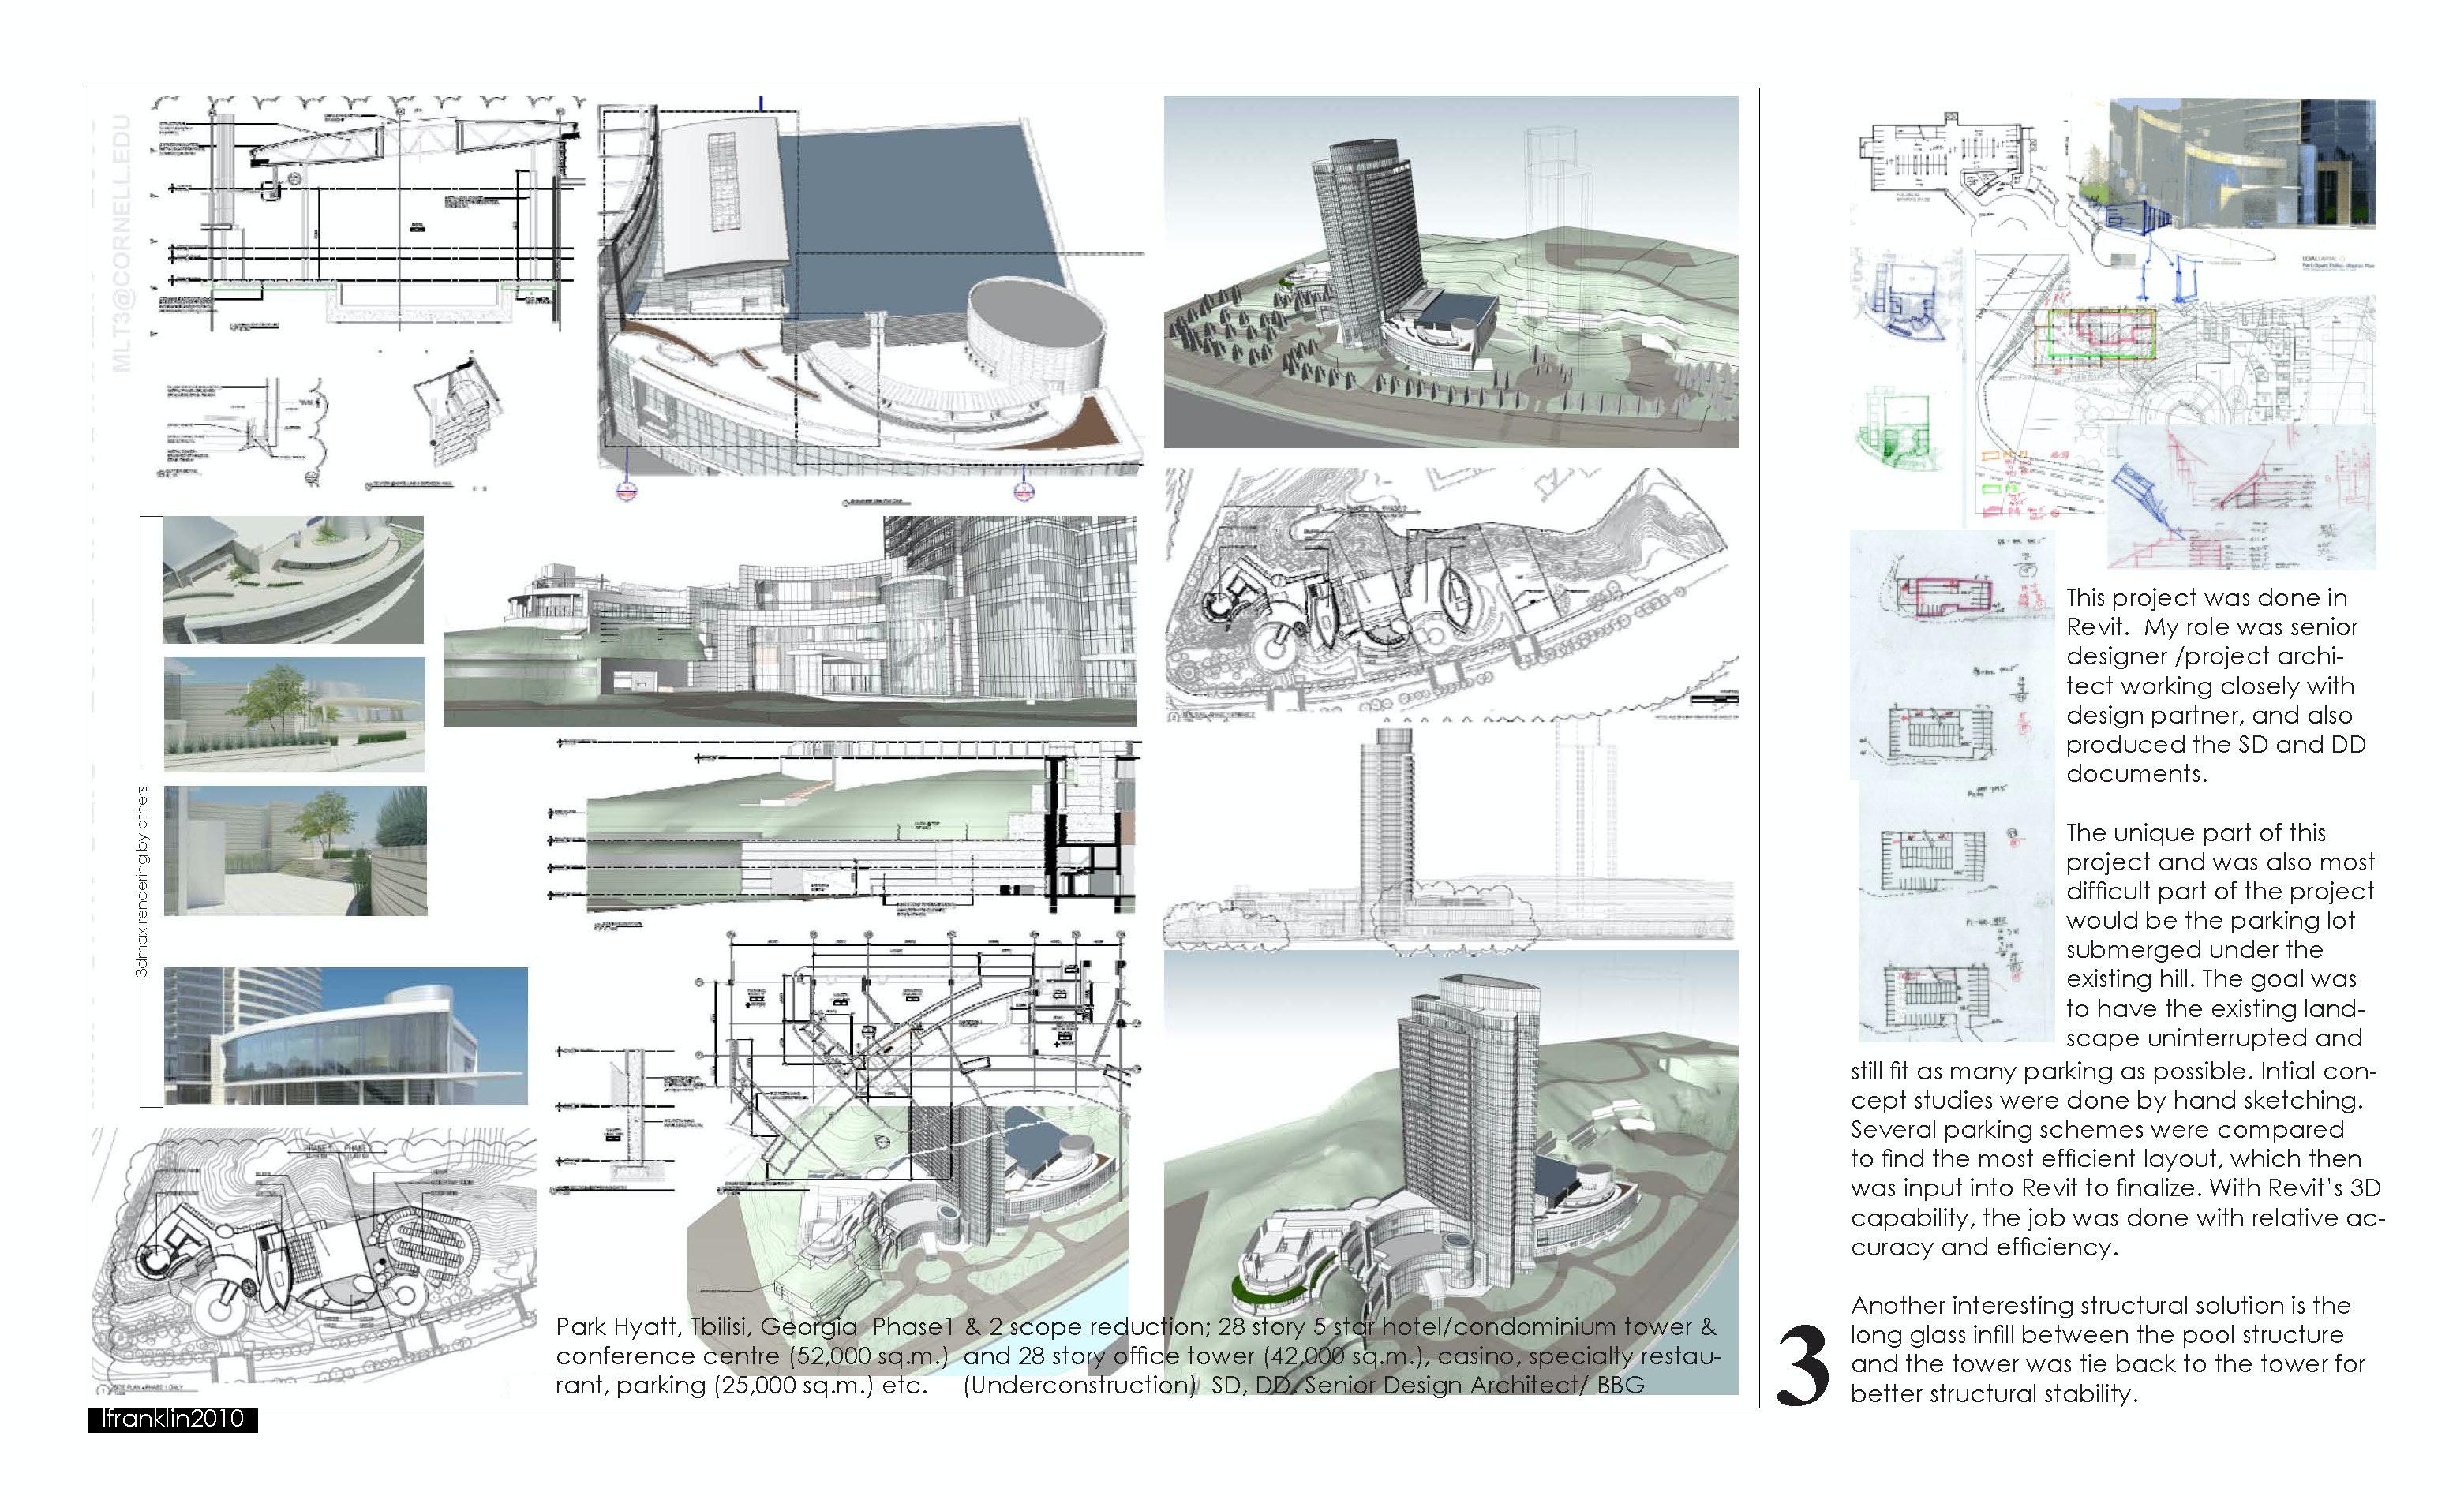 Park Hyatt Tbilisi Georgia Loretta Franklin Archinect